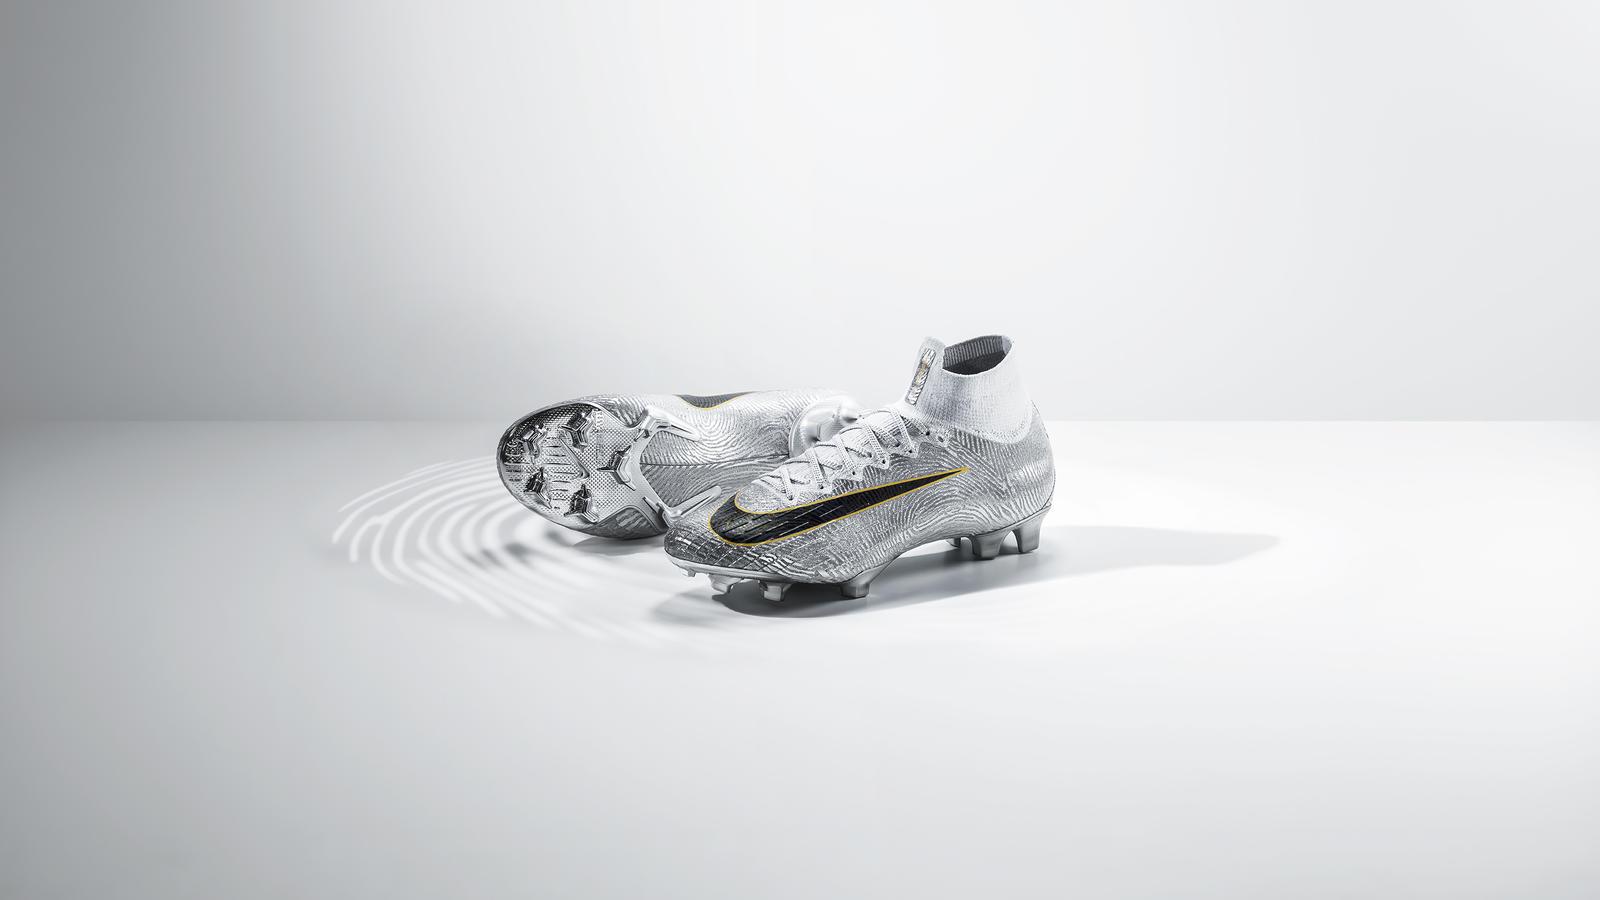 Golden Touch Mercurial 360 - Nike News